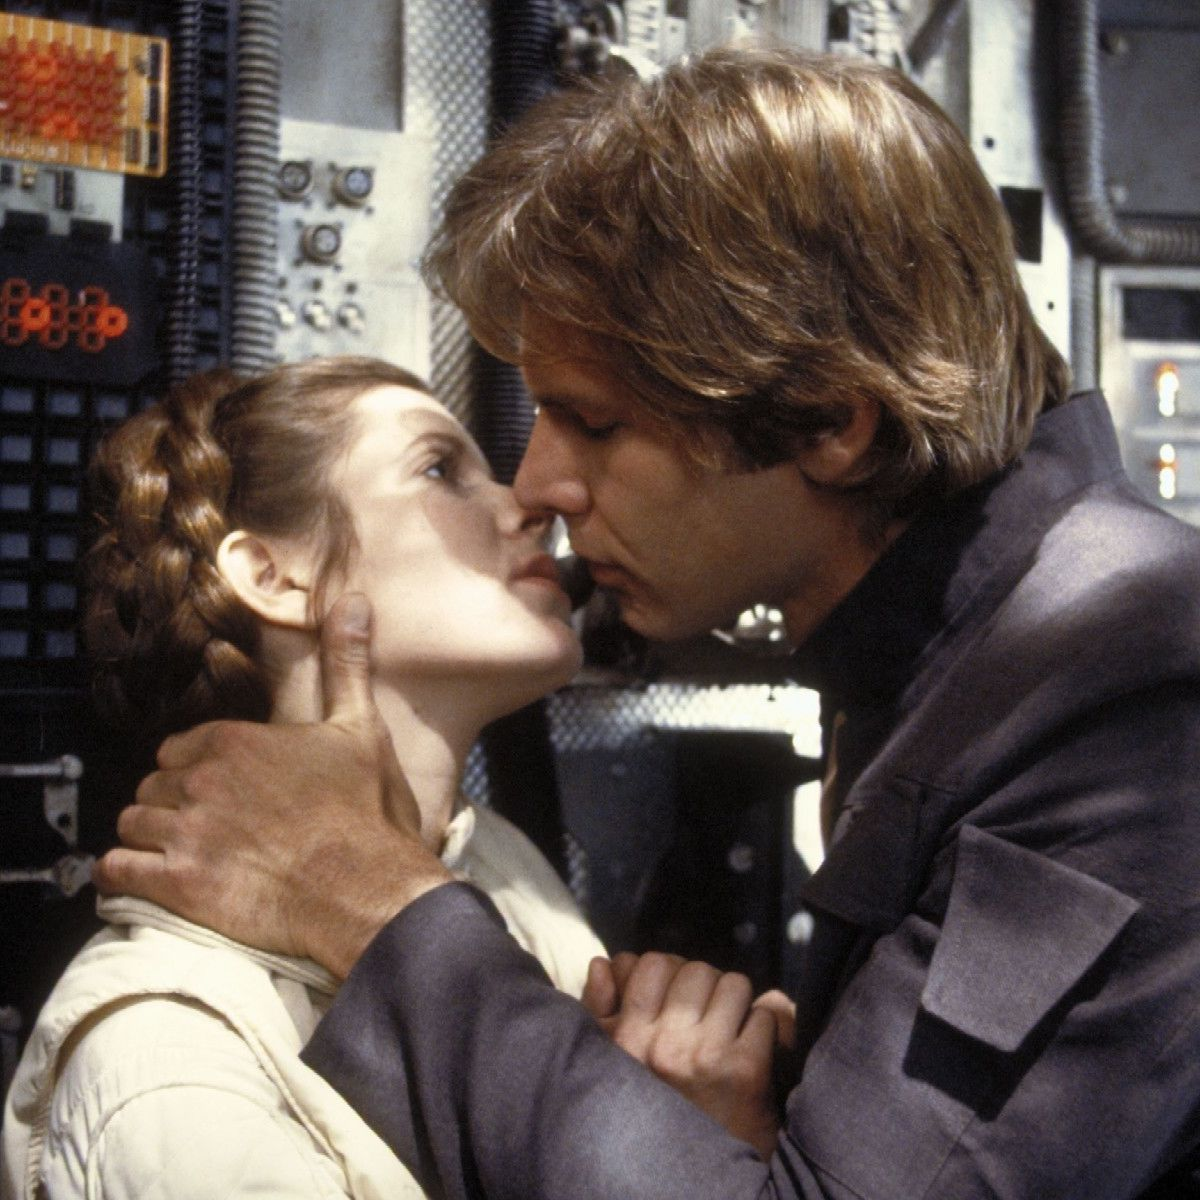 Han and Leia kiss, Star Wars